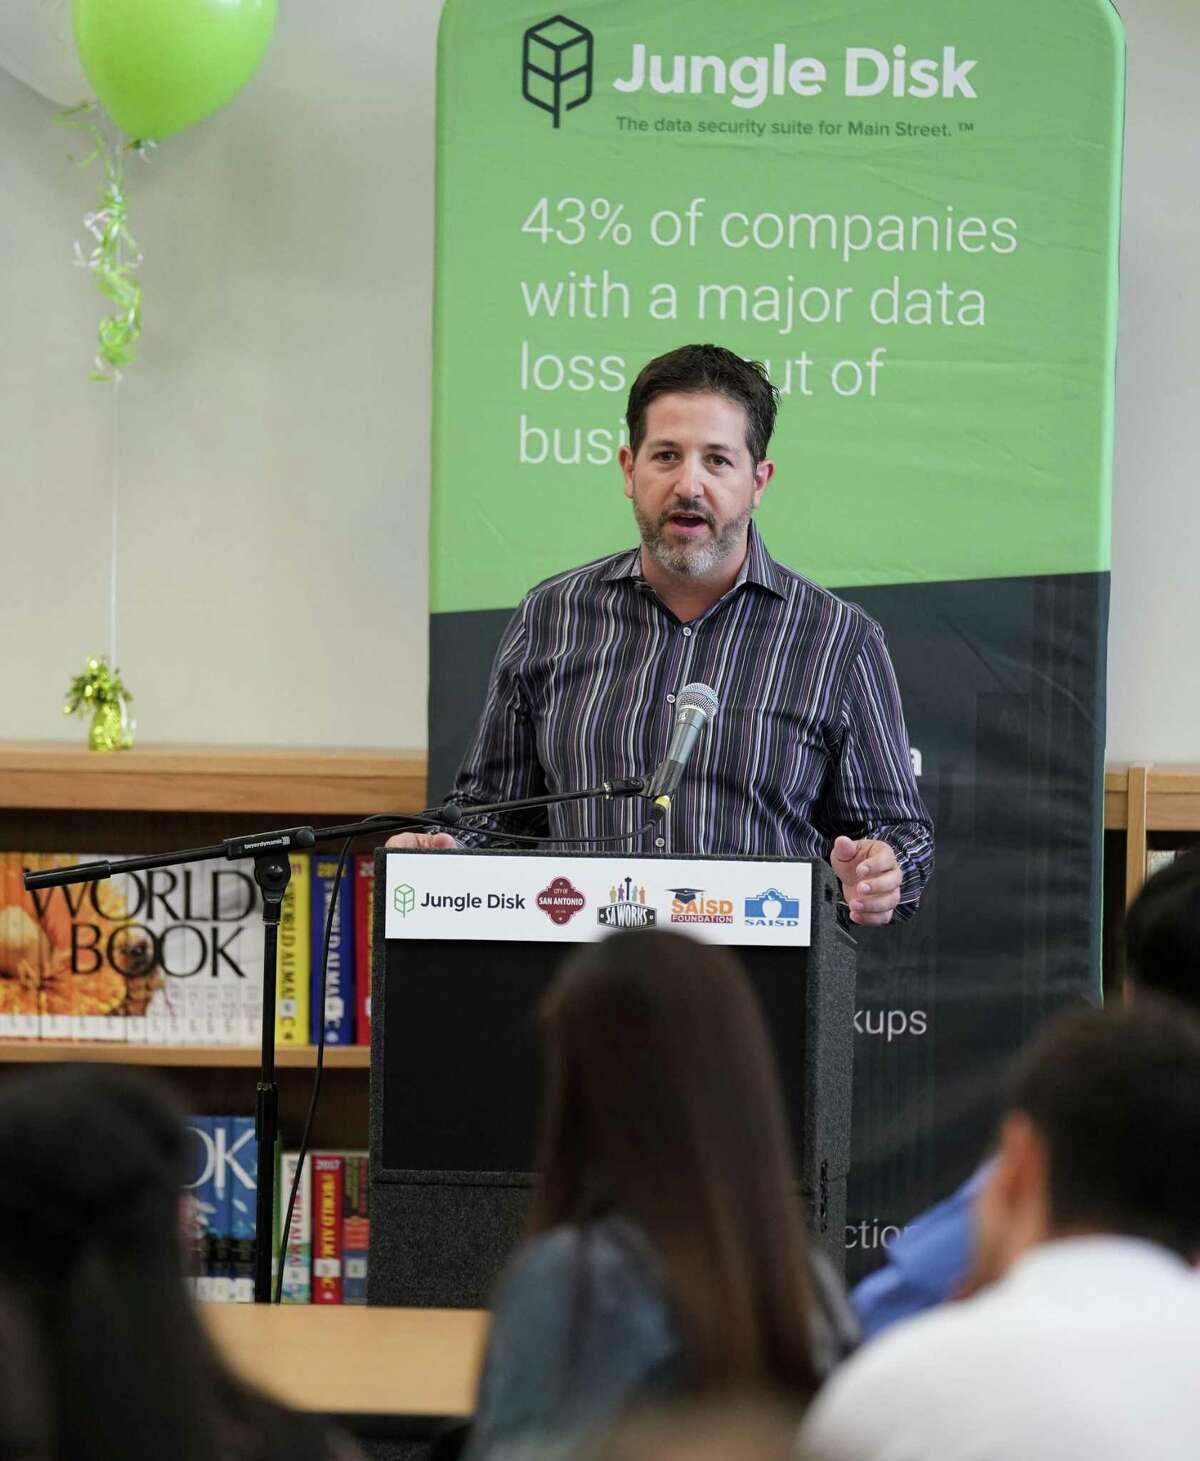 San Antonio has been creating more cybersecurity jobs. Jungle Disk CEO Bret Piatt speaks to interns in the field.